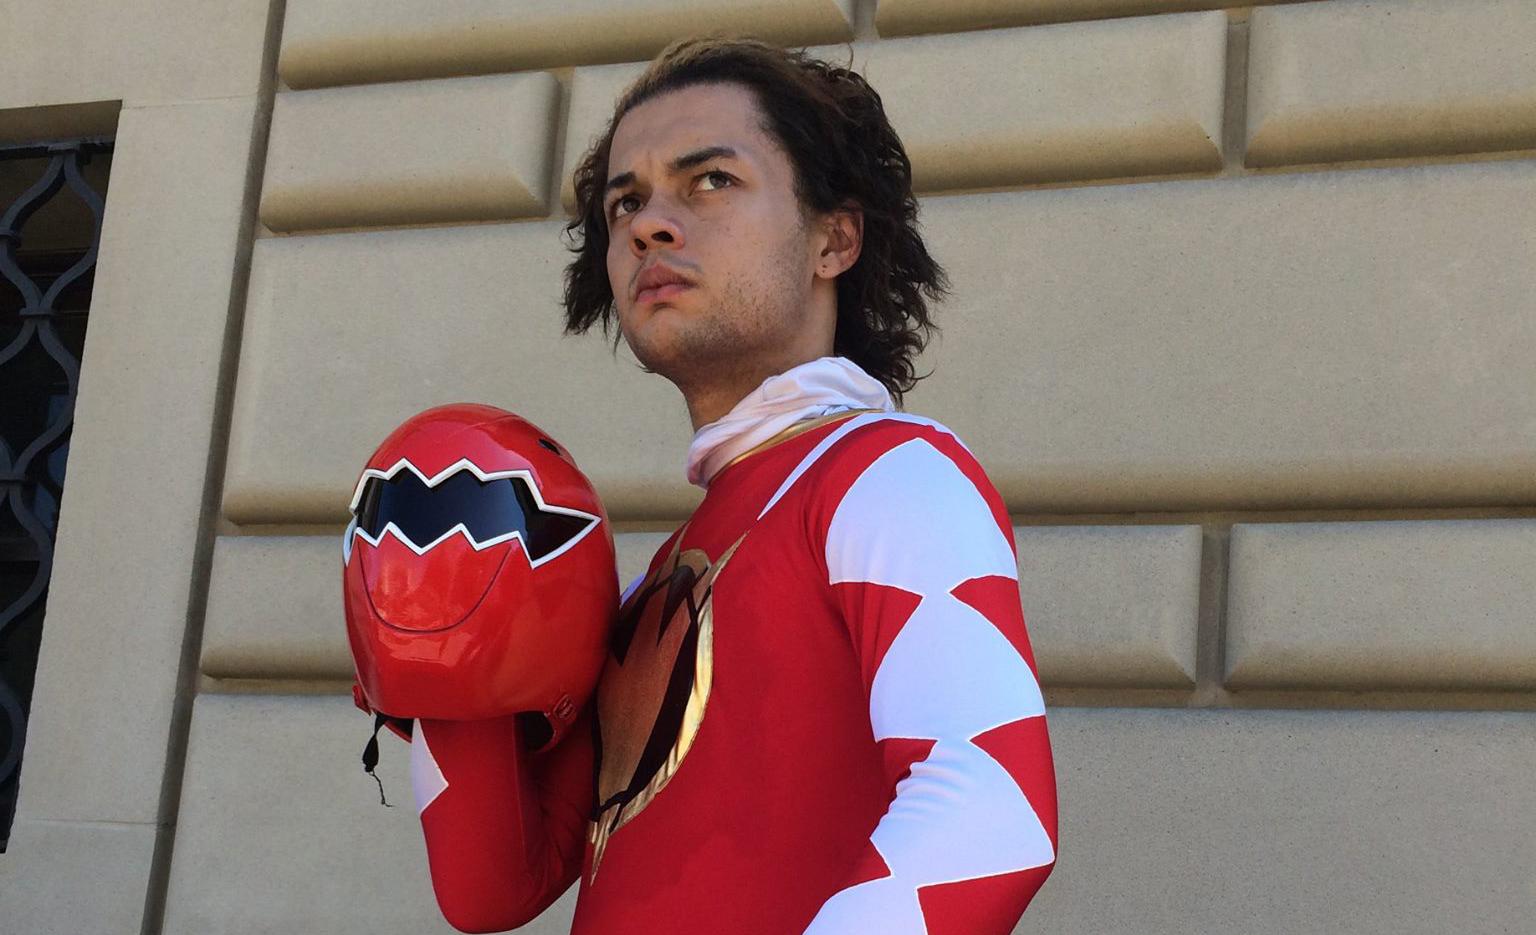 Cosplayer Feature: The Grandmaster Ranger